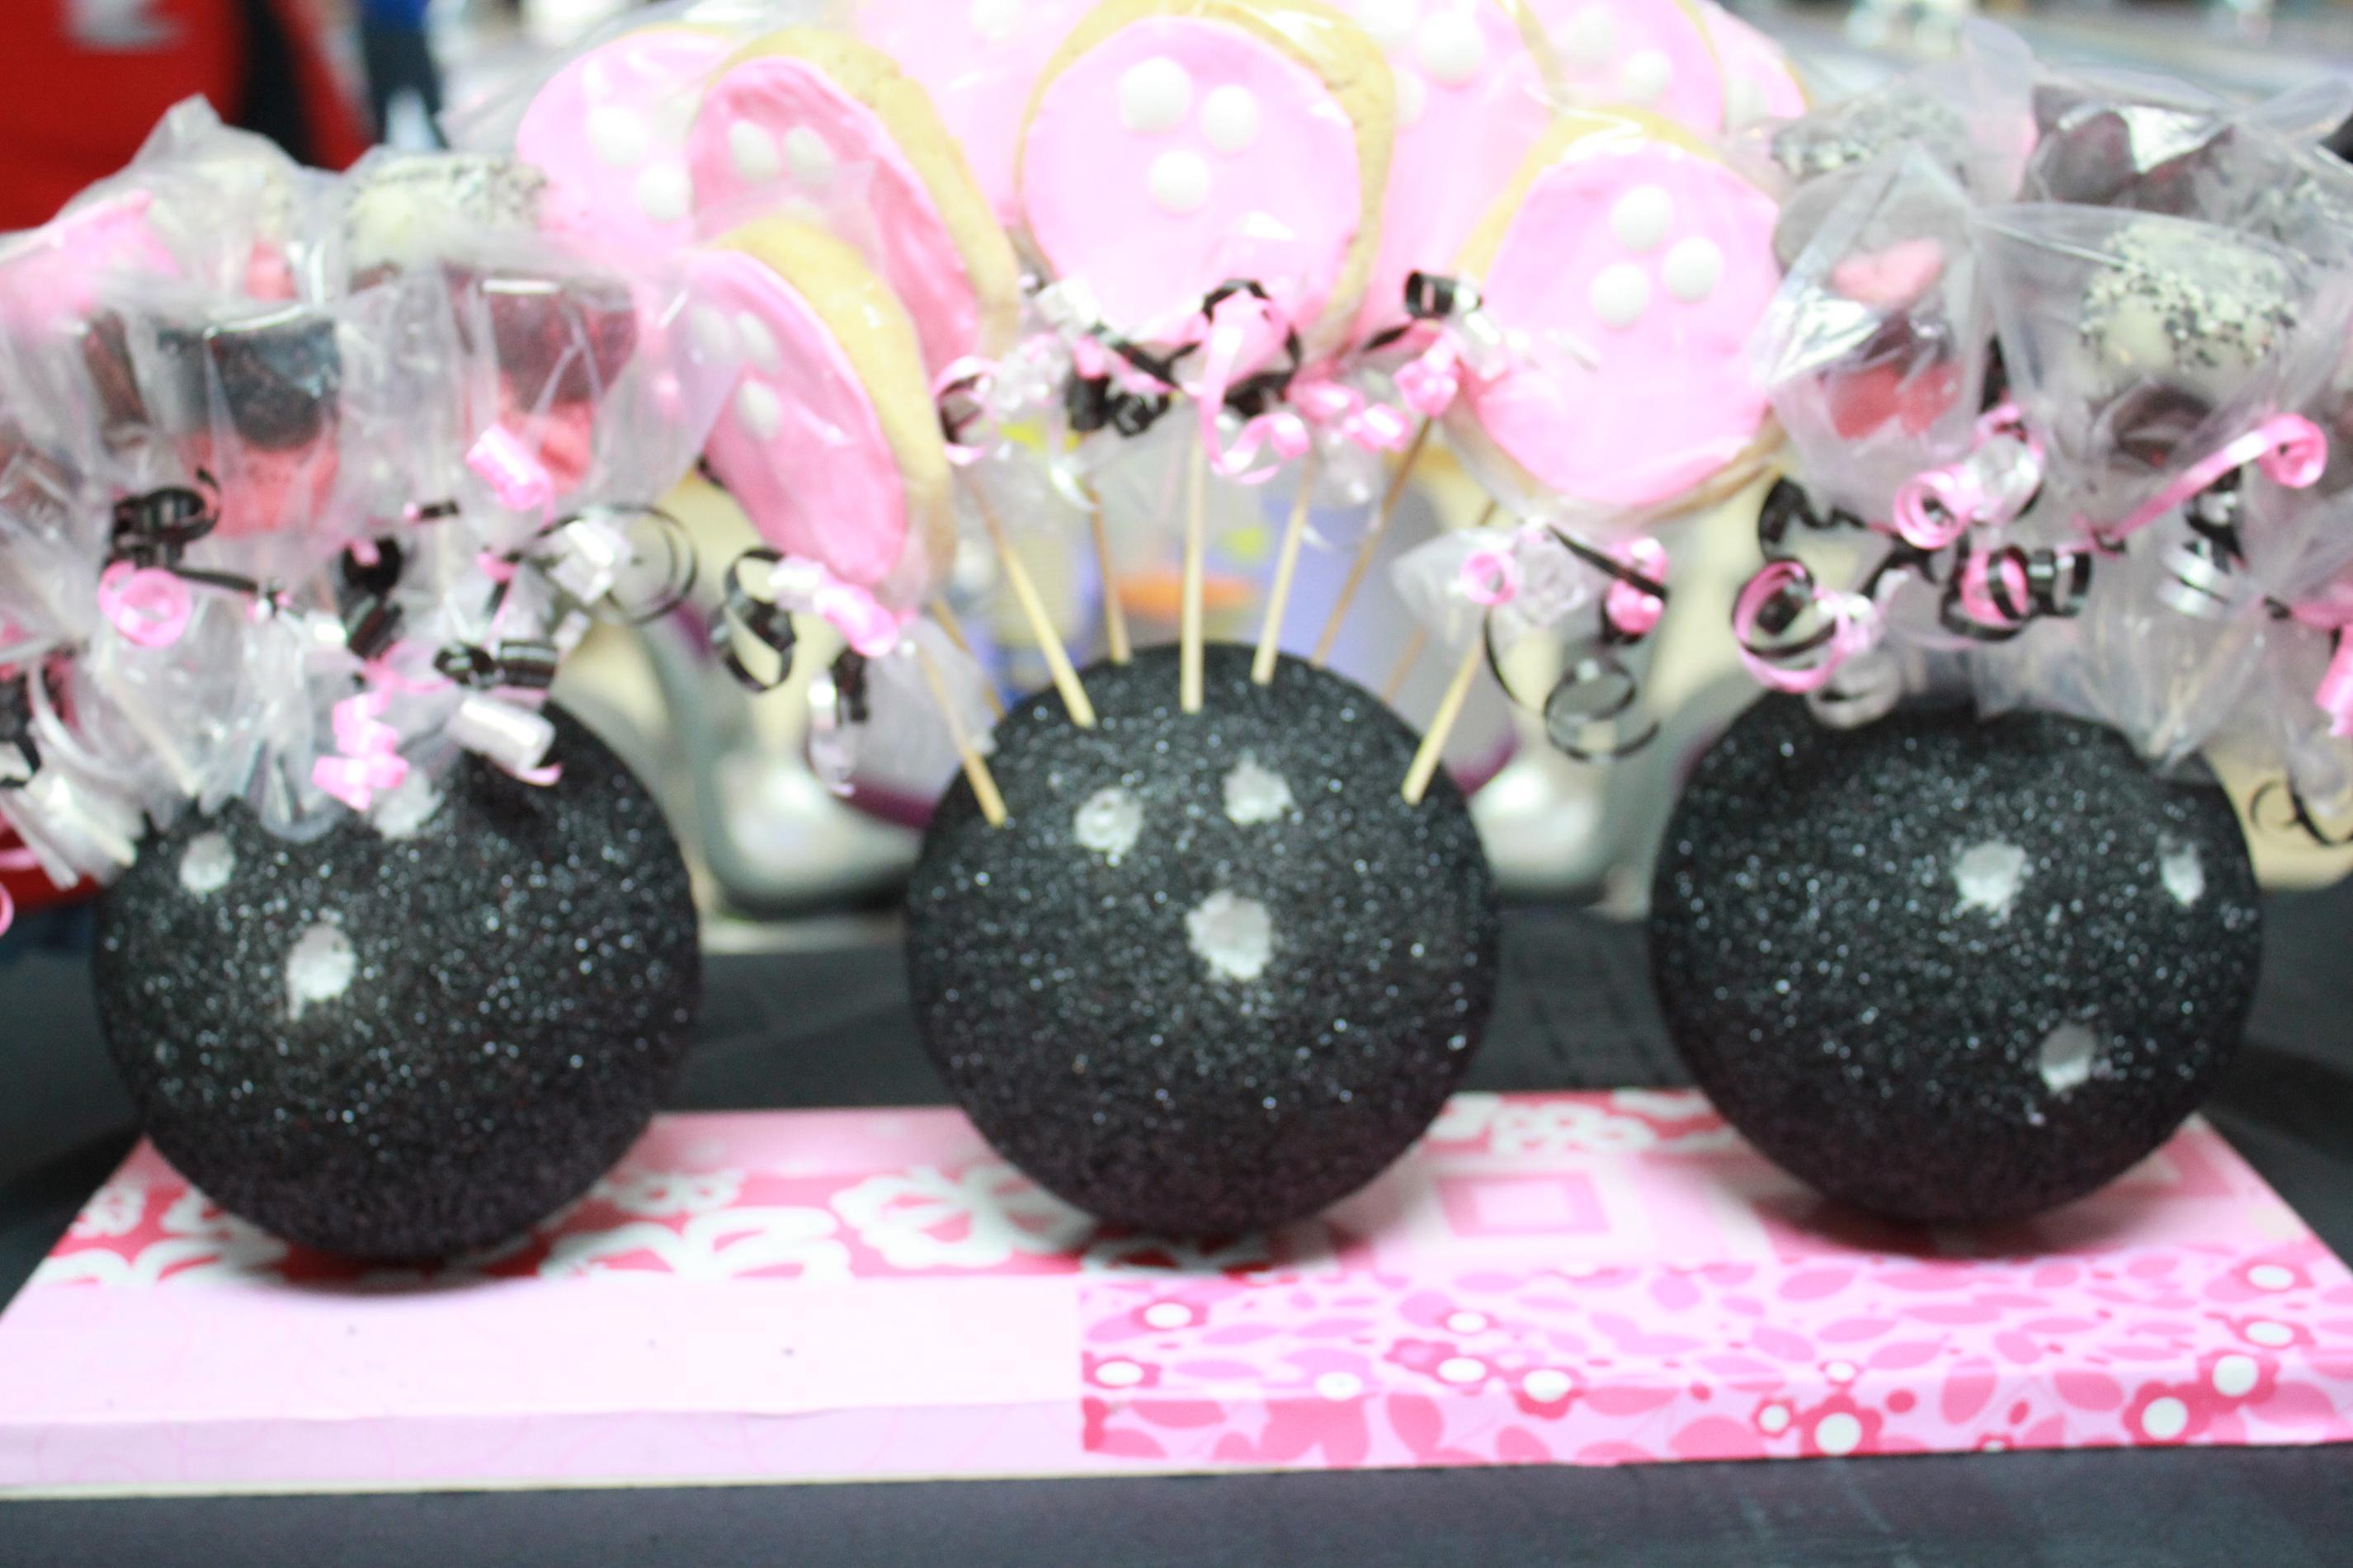 styrofoam bowling balls